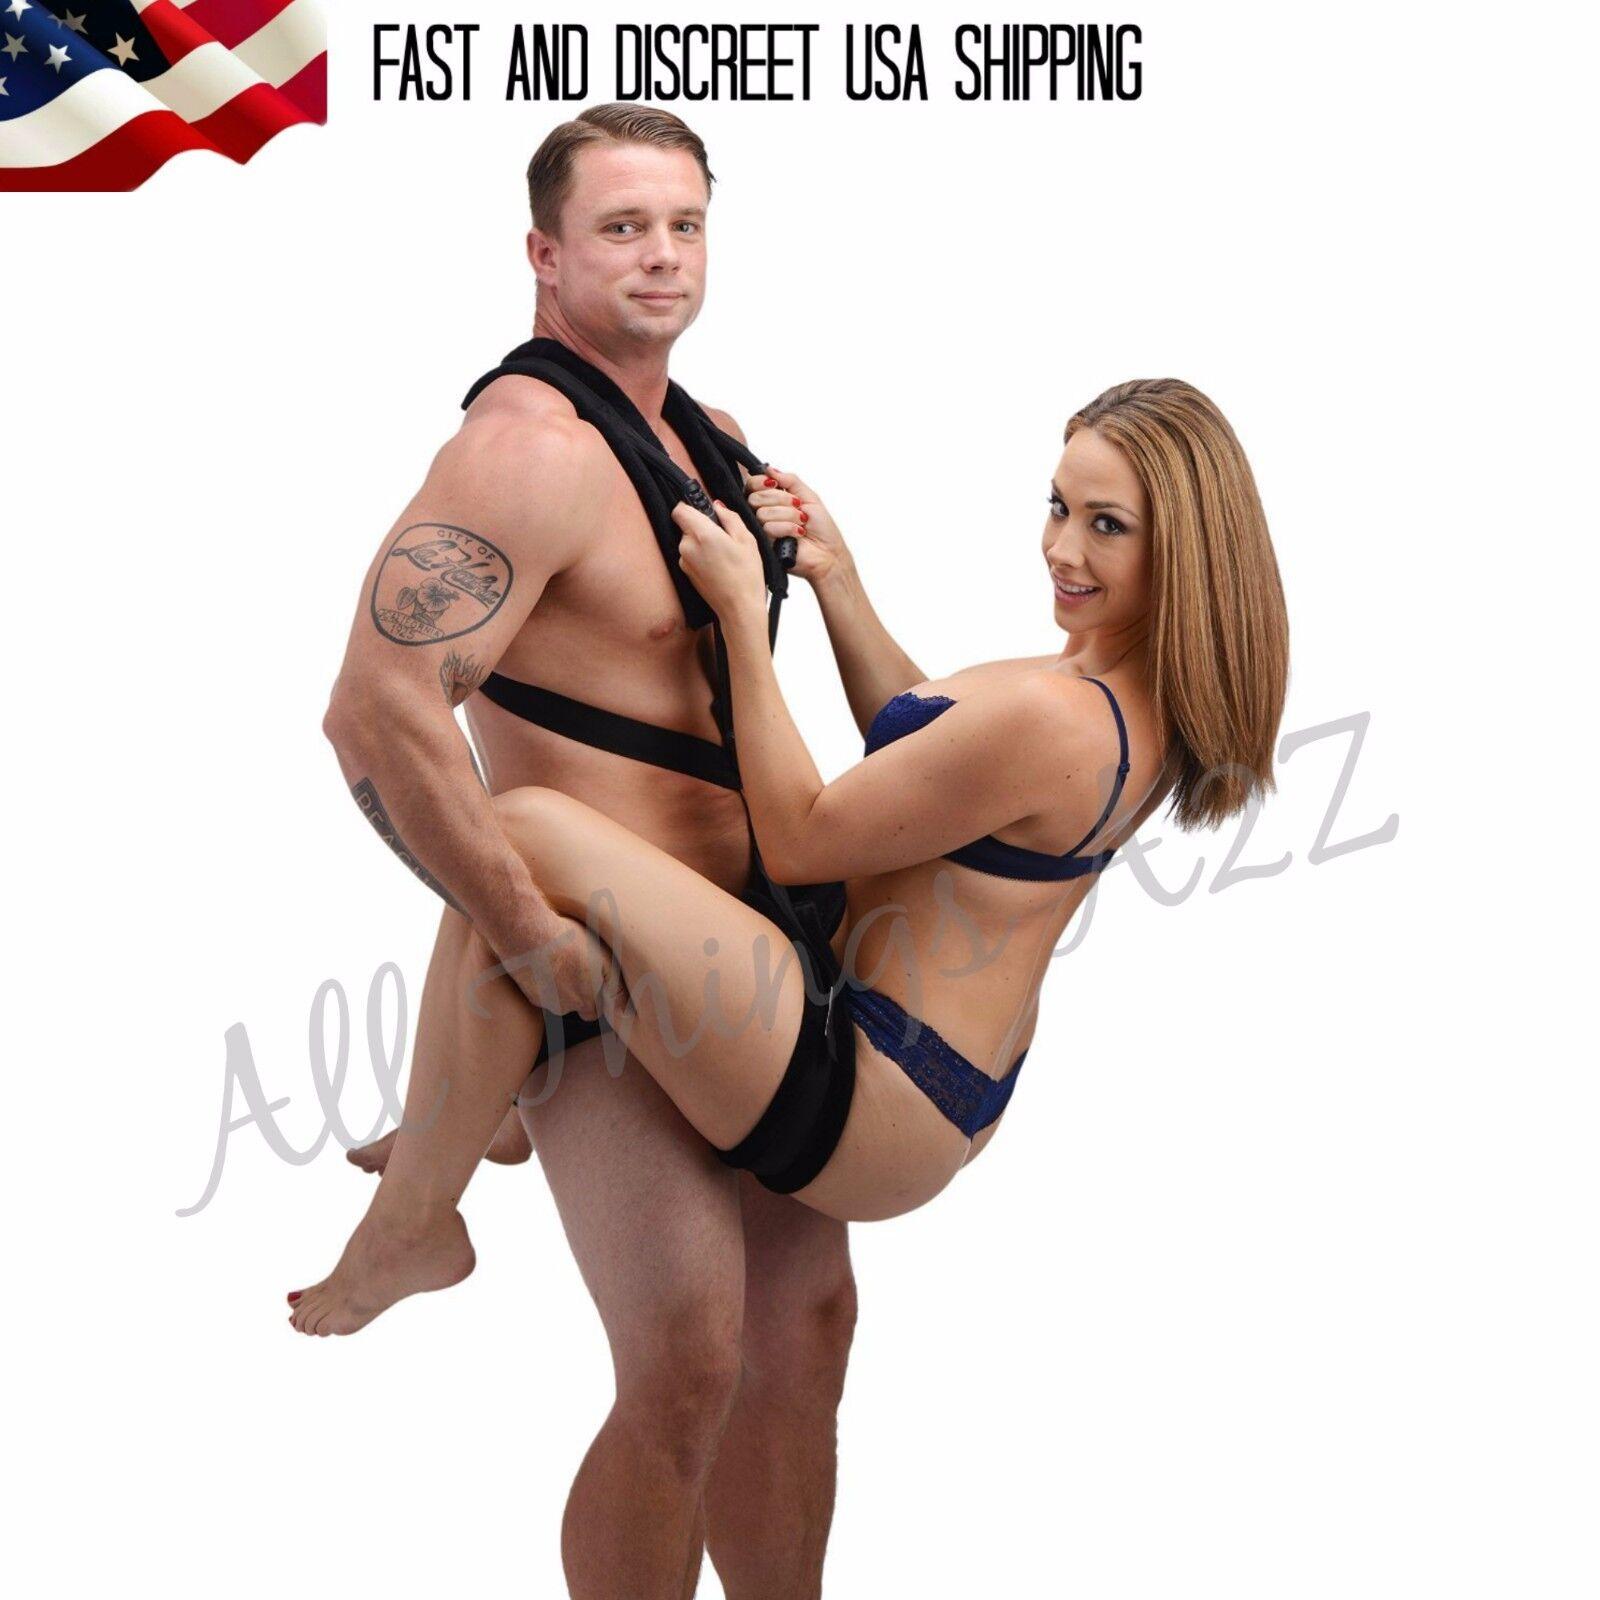 Couples Body Swing Love Adult Bedroom Fun Game Kinky Bondage